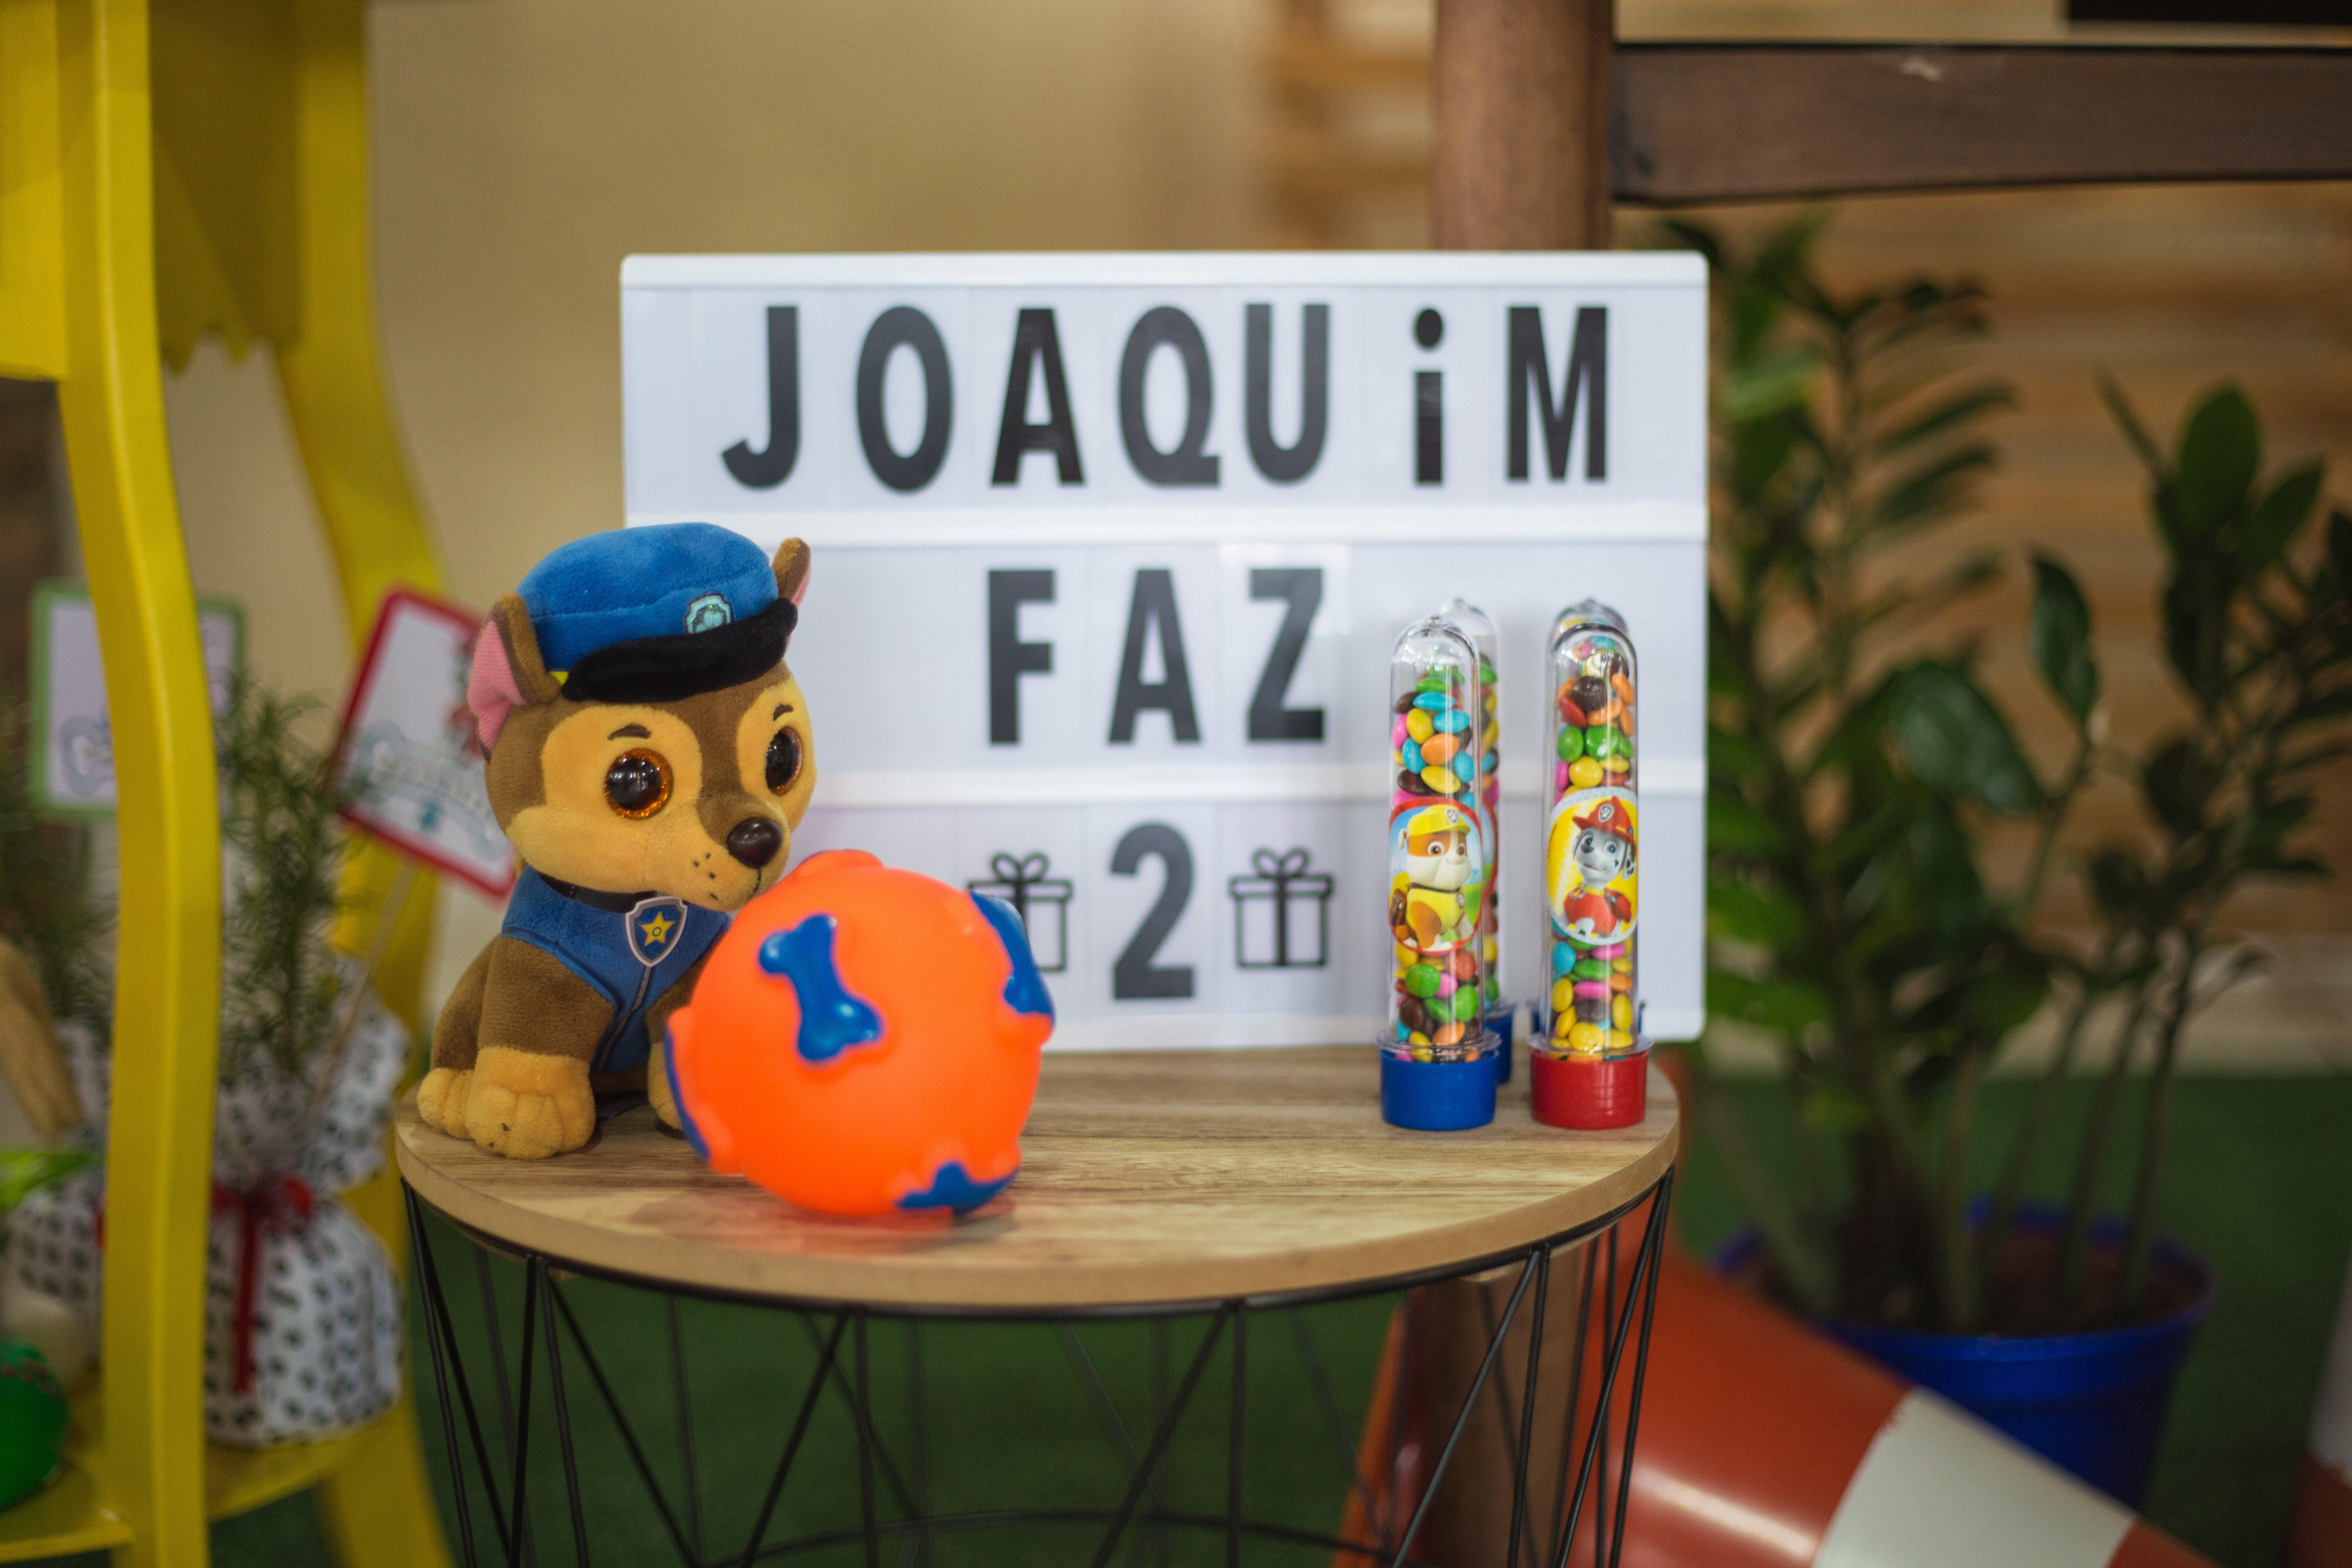 Festa‐Infantil‐Florianopolis‐Ana‐Marmo‐FotografiaFesta‐Infantil‐Florianopolis‐Ana‐Marmo‐Fotografia191A0233